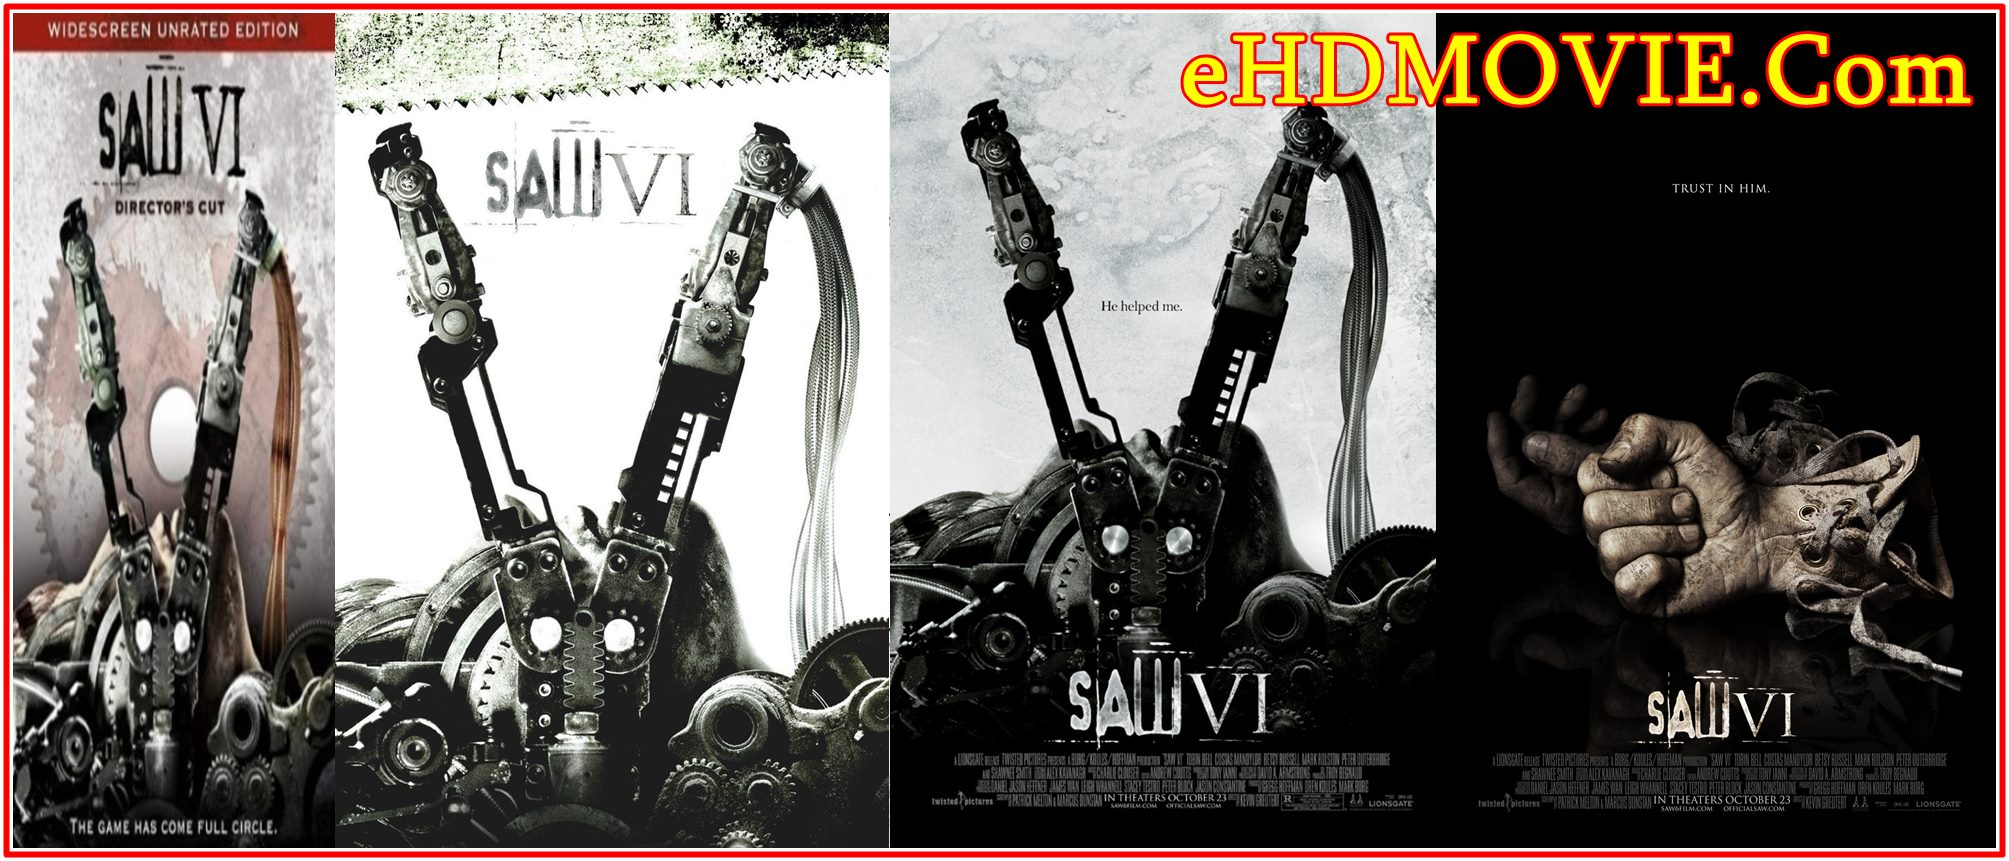 Saw VI 2009 Full Movie English 720p – 480p ORG BRRip 350MB – 750MB ESubs Free Download